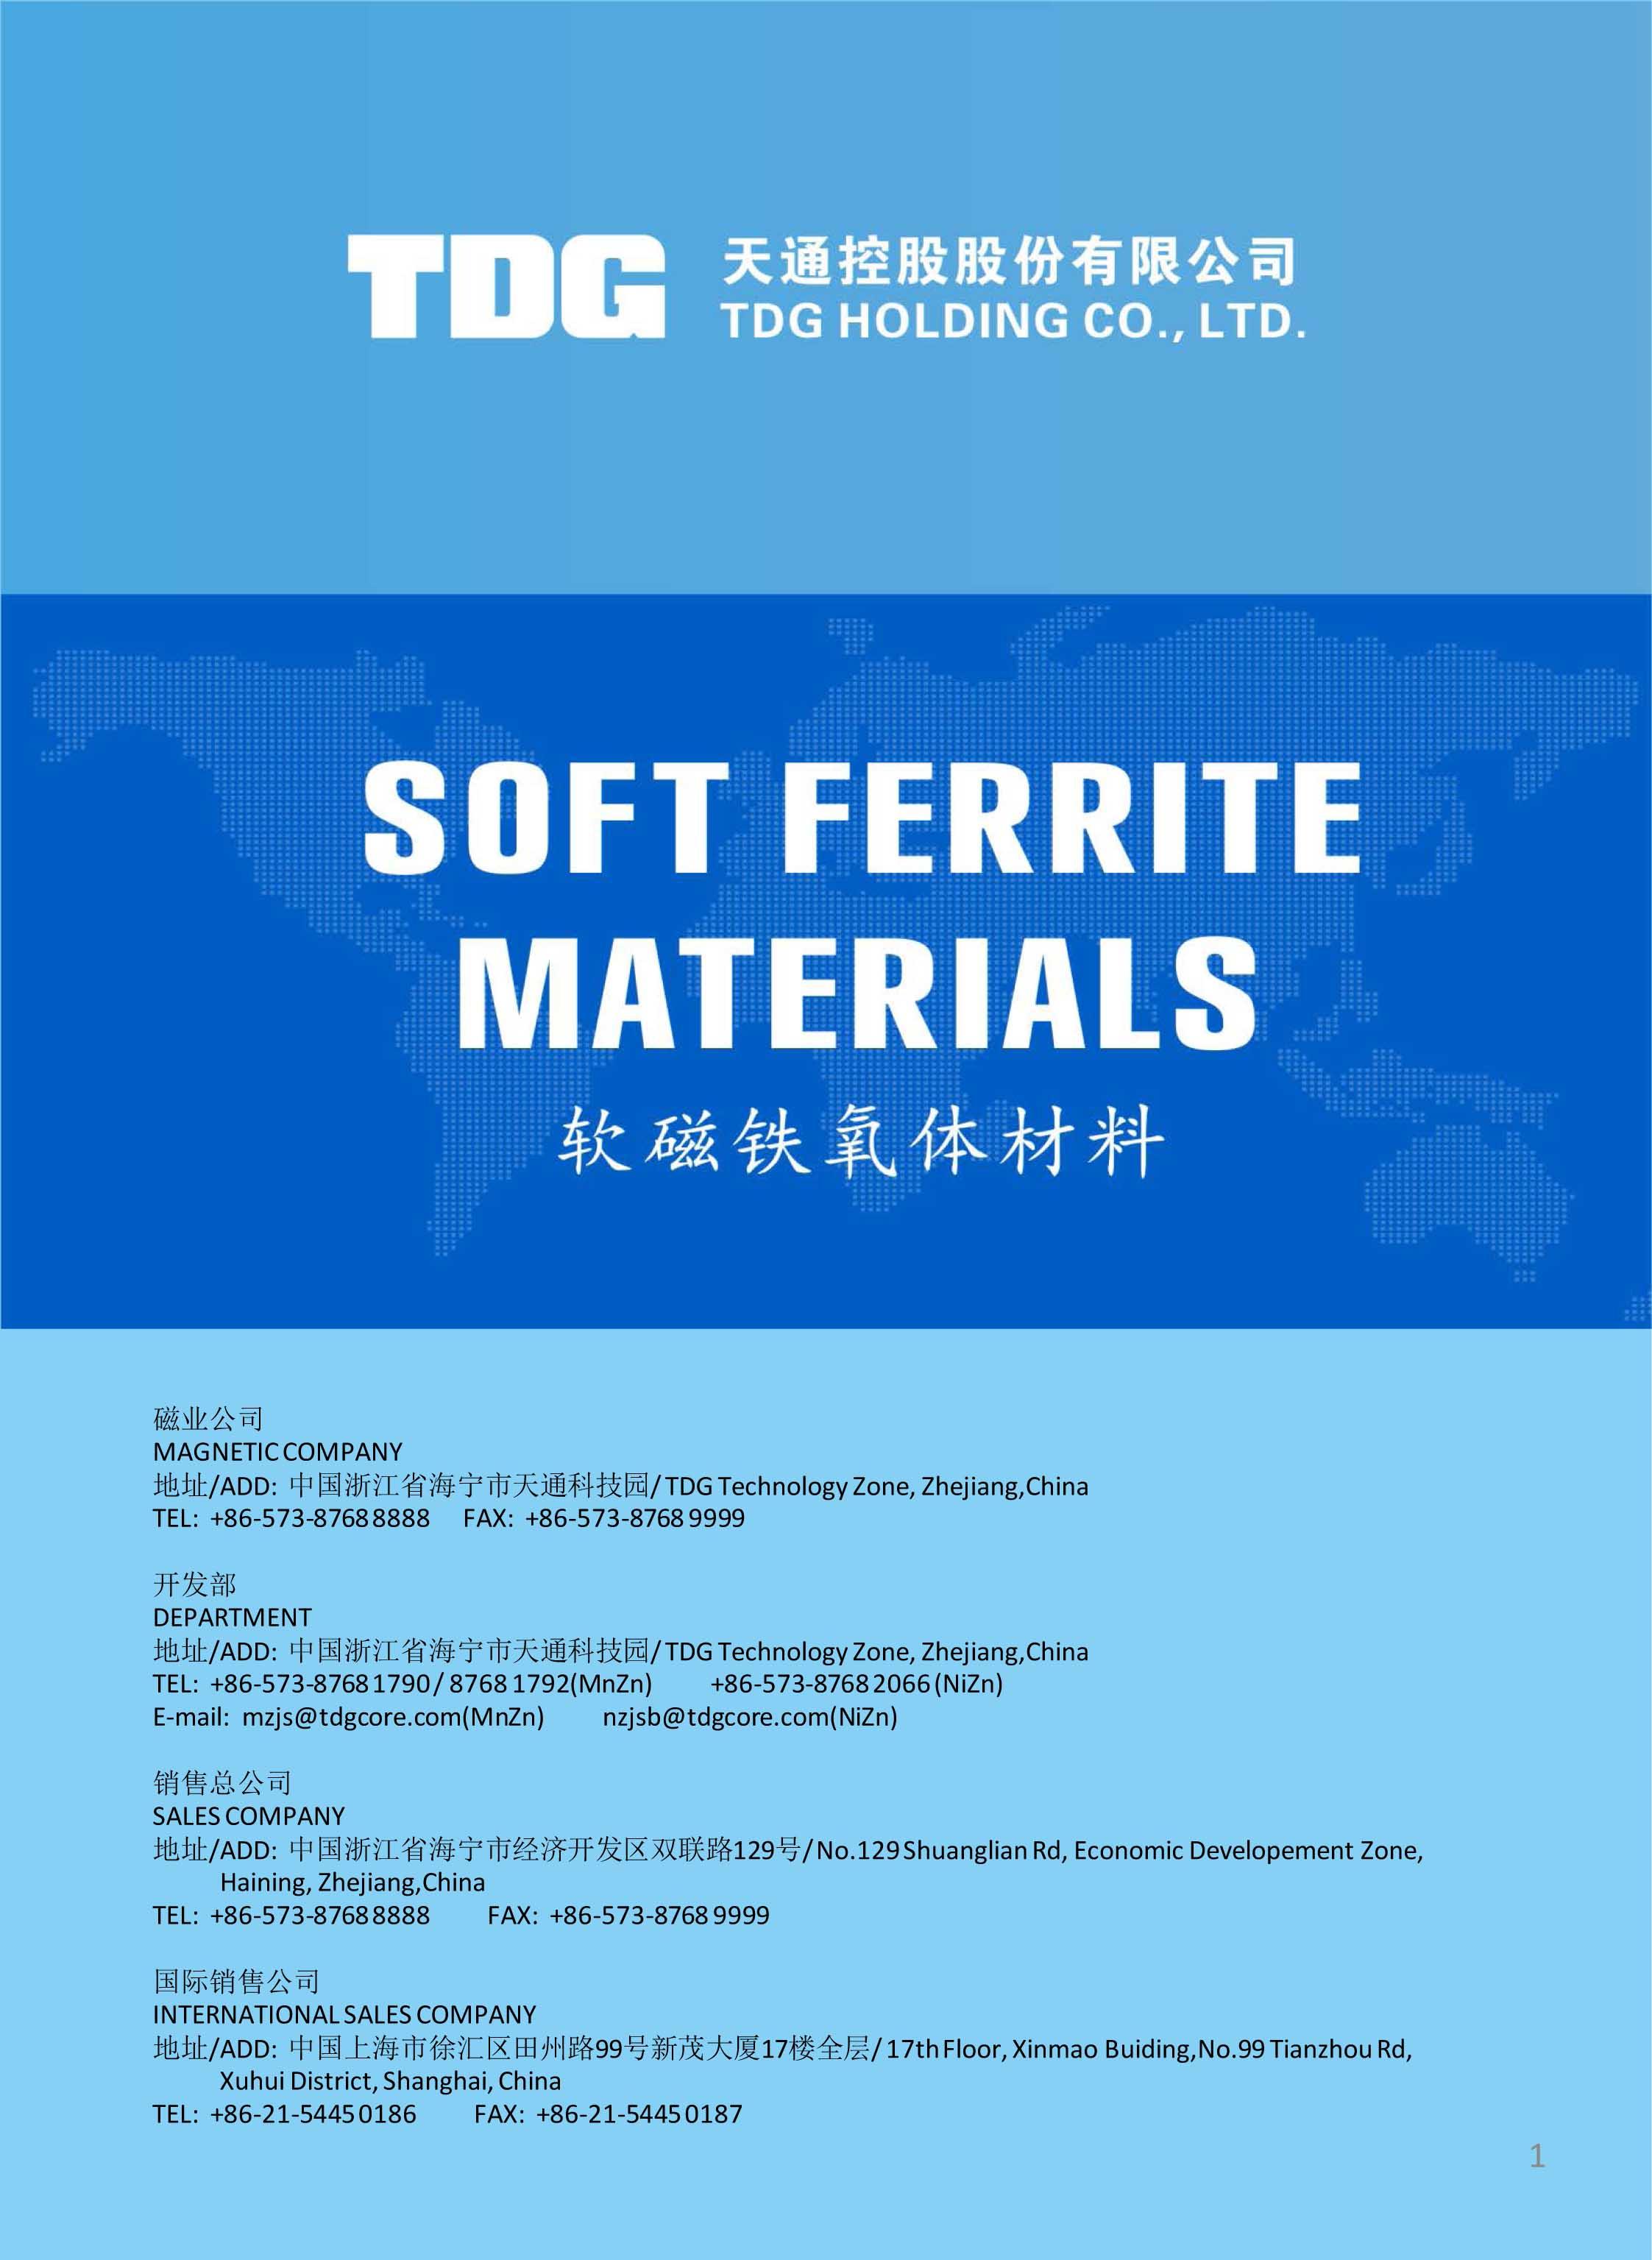 Soft Ferrite Materials - TDG HOLDING CO , LTD